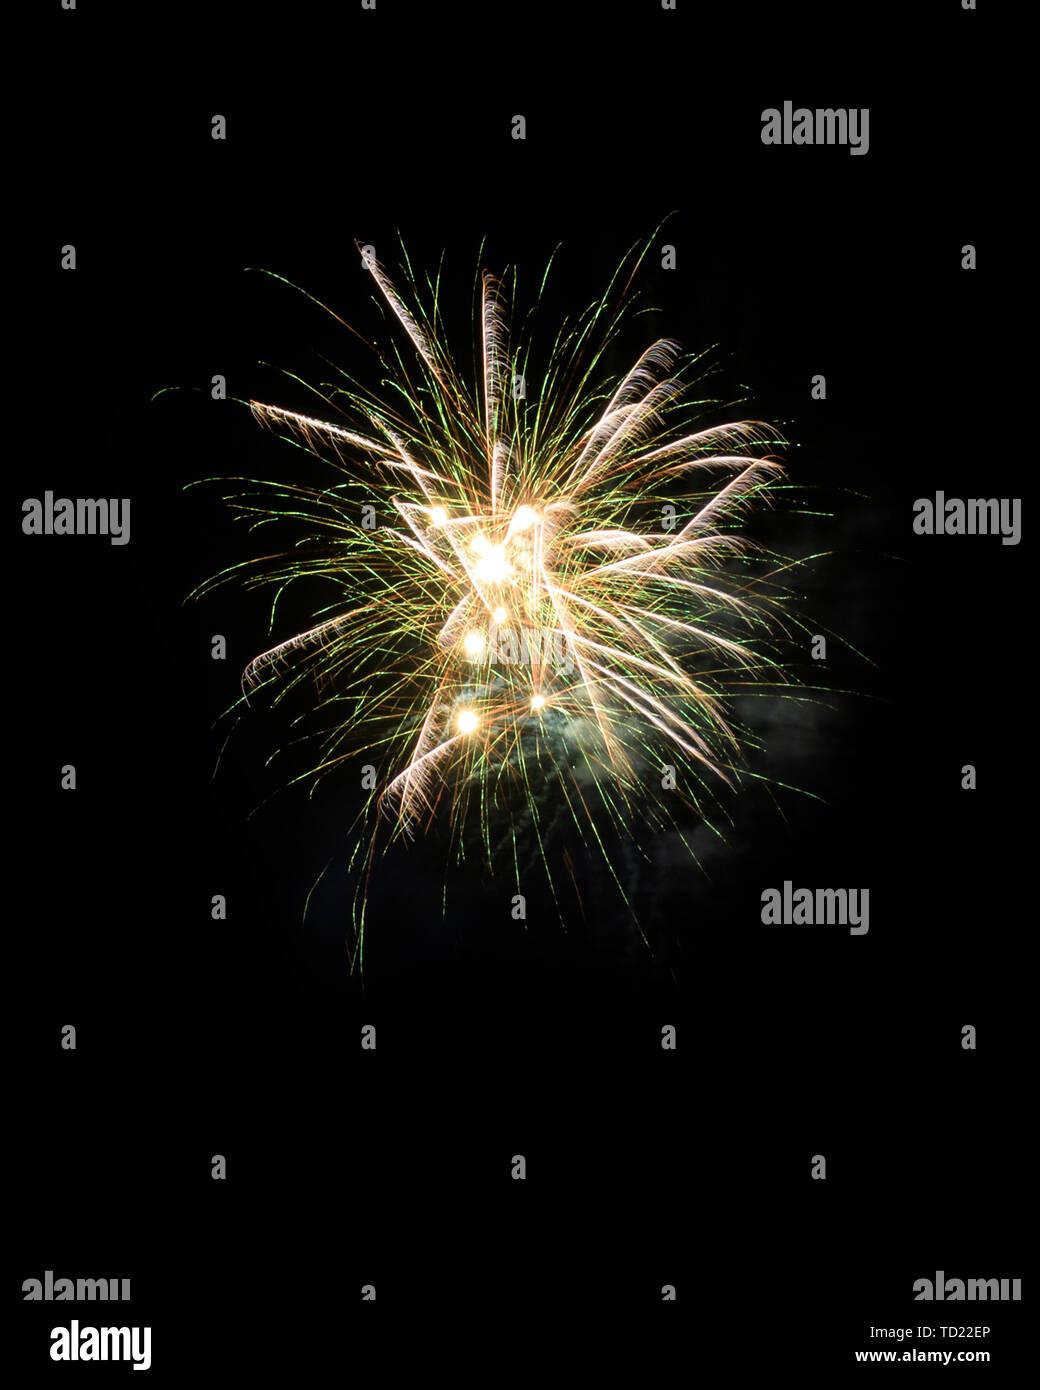 Feuerwerk Hintergrundbild Stockfoto